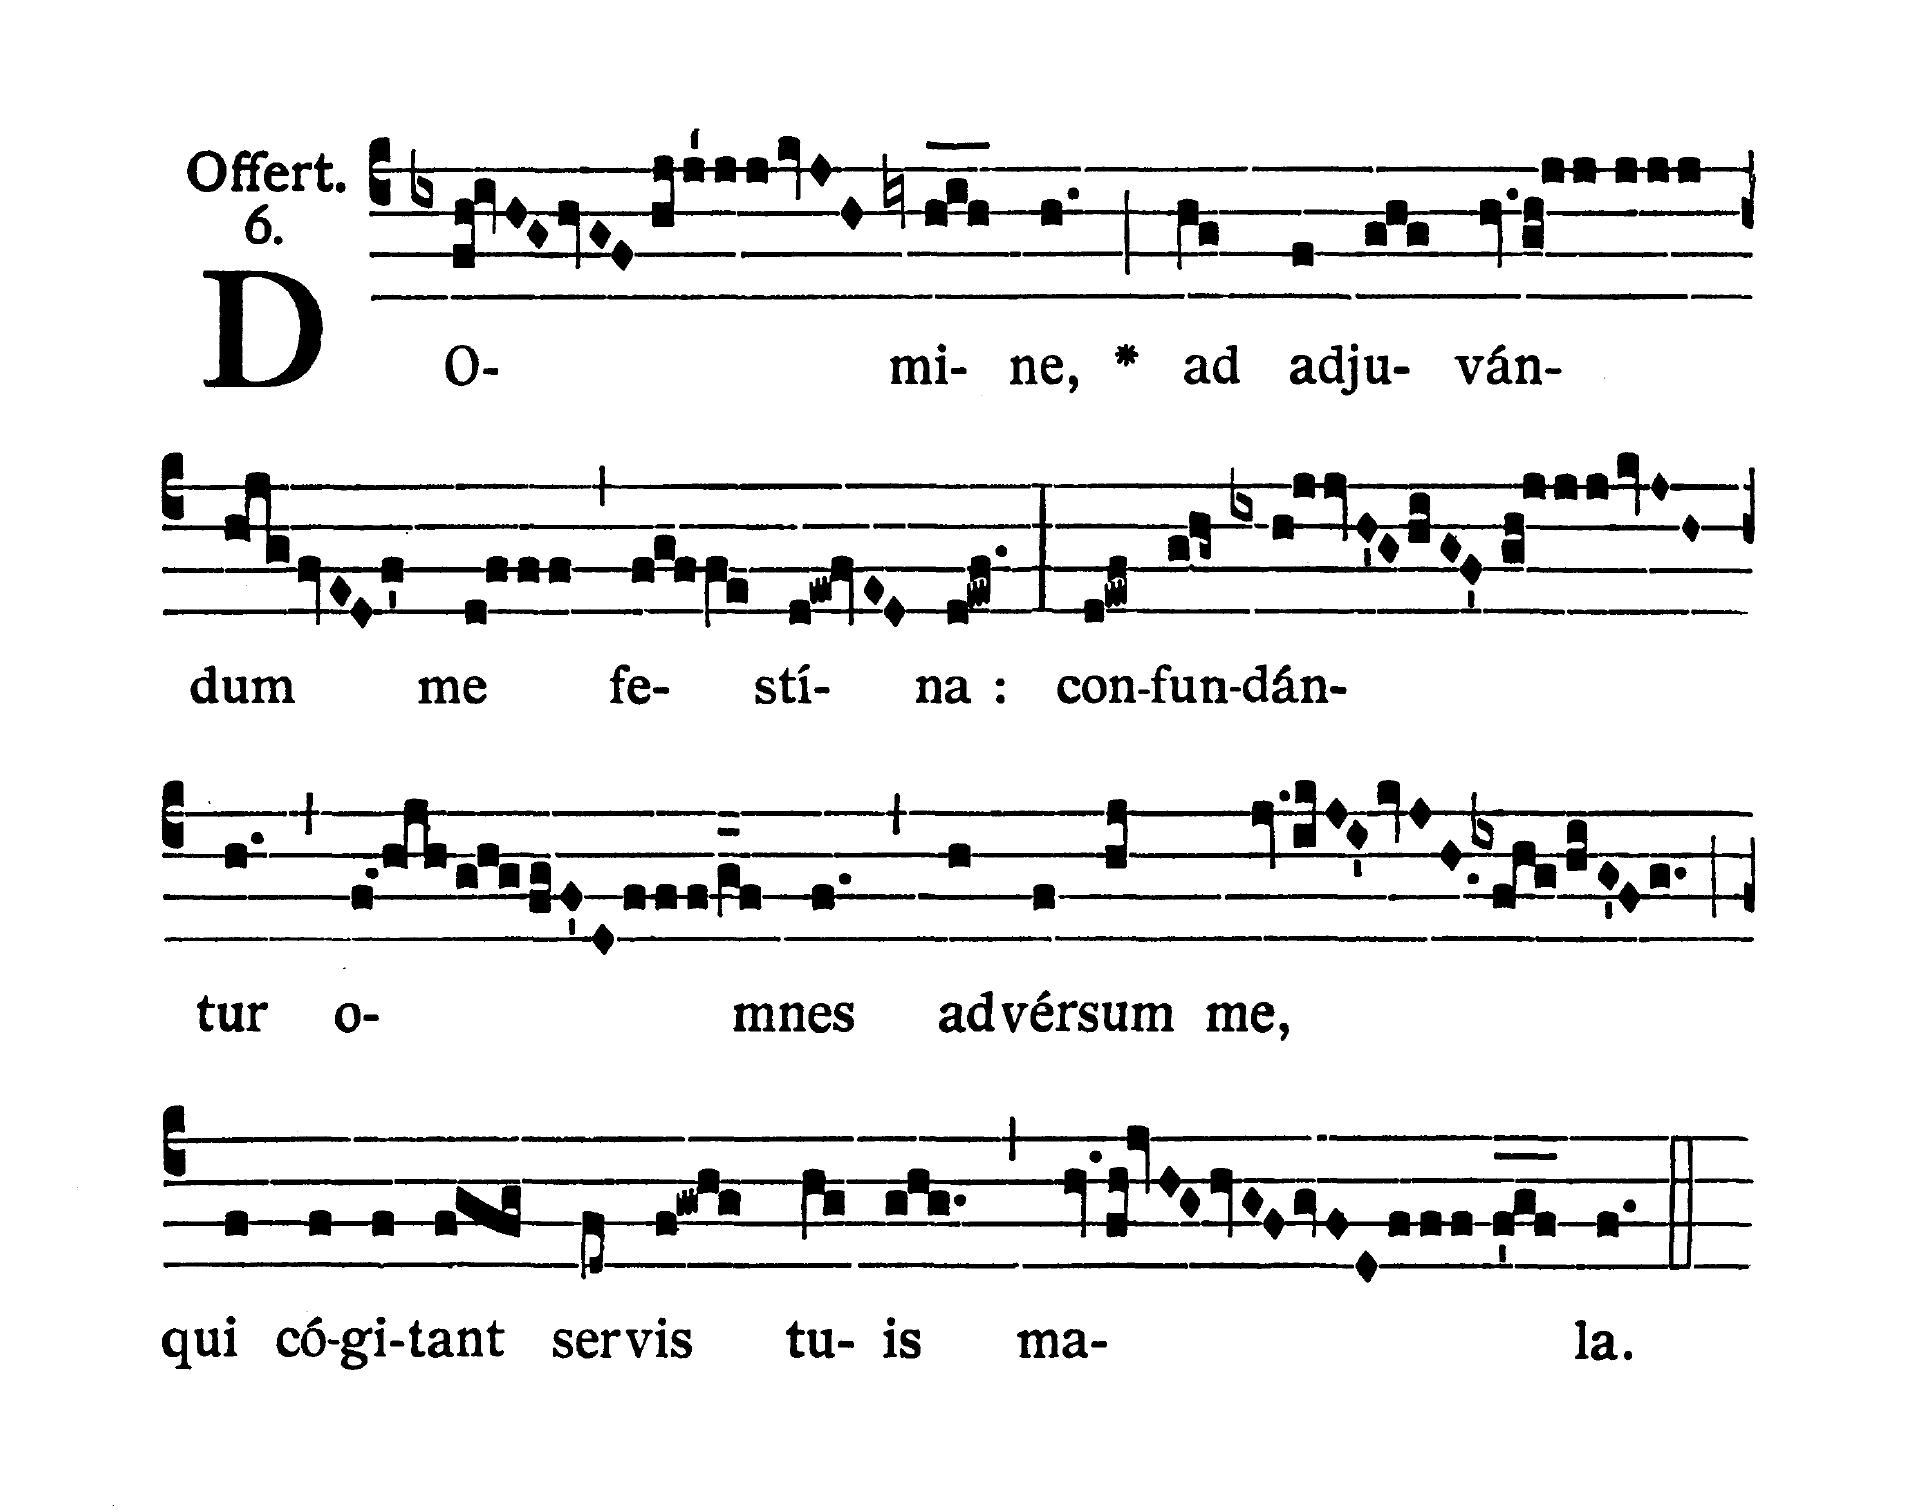 Feria V post Dominicam IV Quadragesimae (Thursday after Fourth Sunday of Lent) - Offertorium (Domine ad adjuvandum)